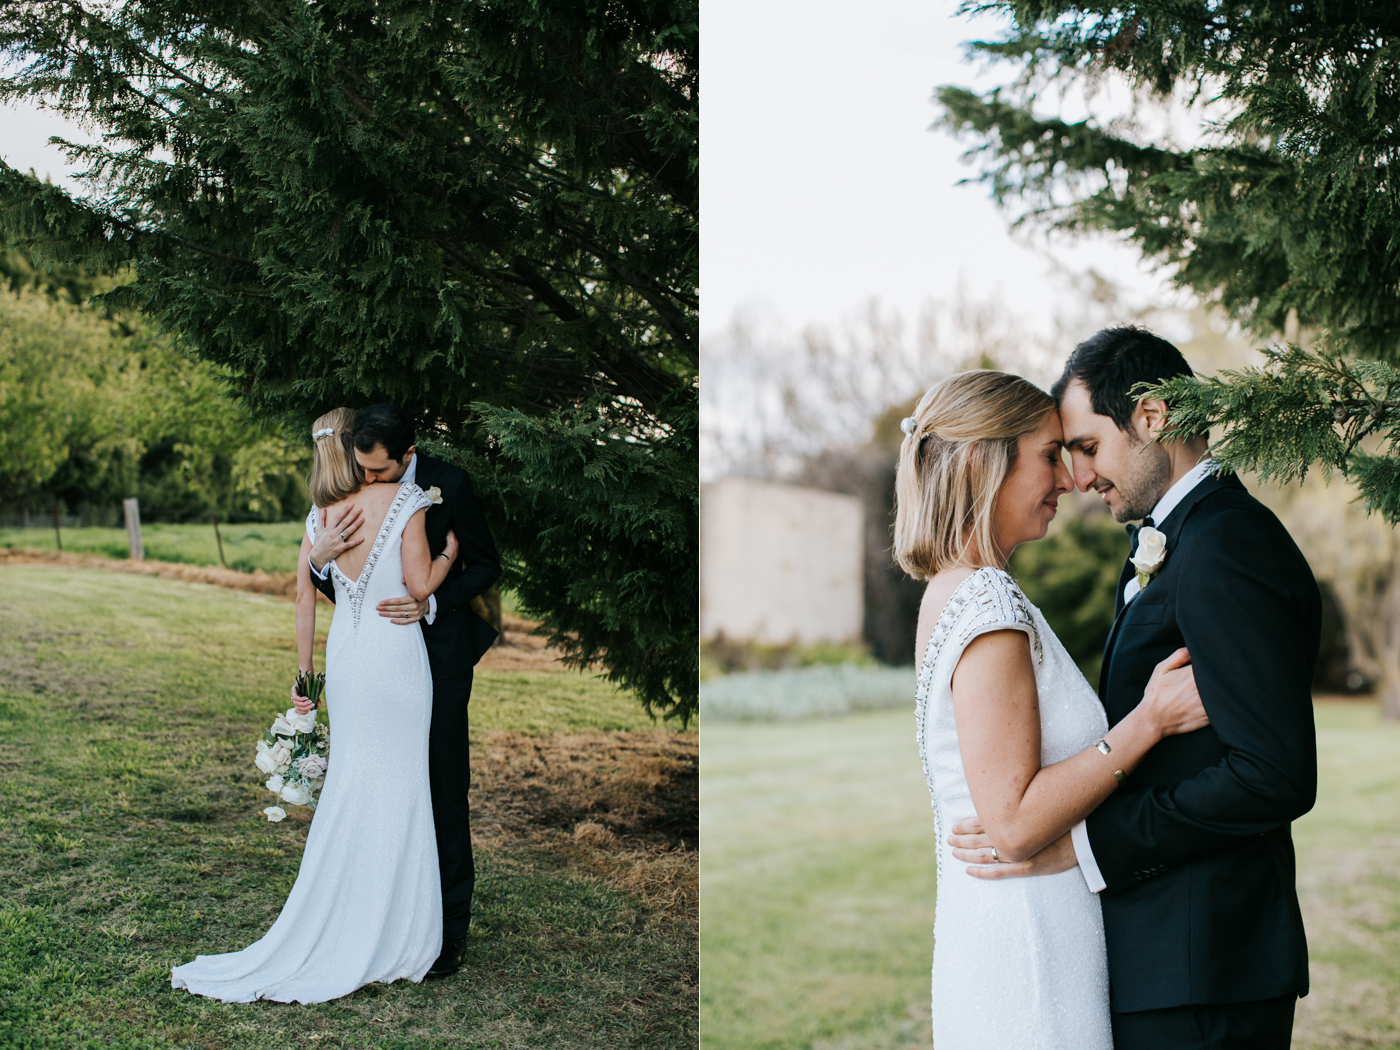 Bridget & James - Orange Country Wedding - Samantha Heather Photography-142.jpg